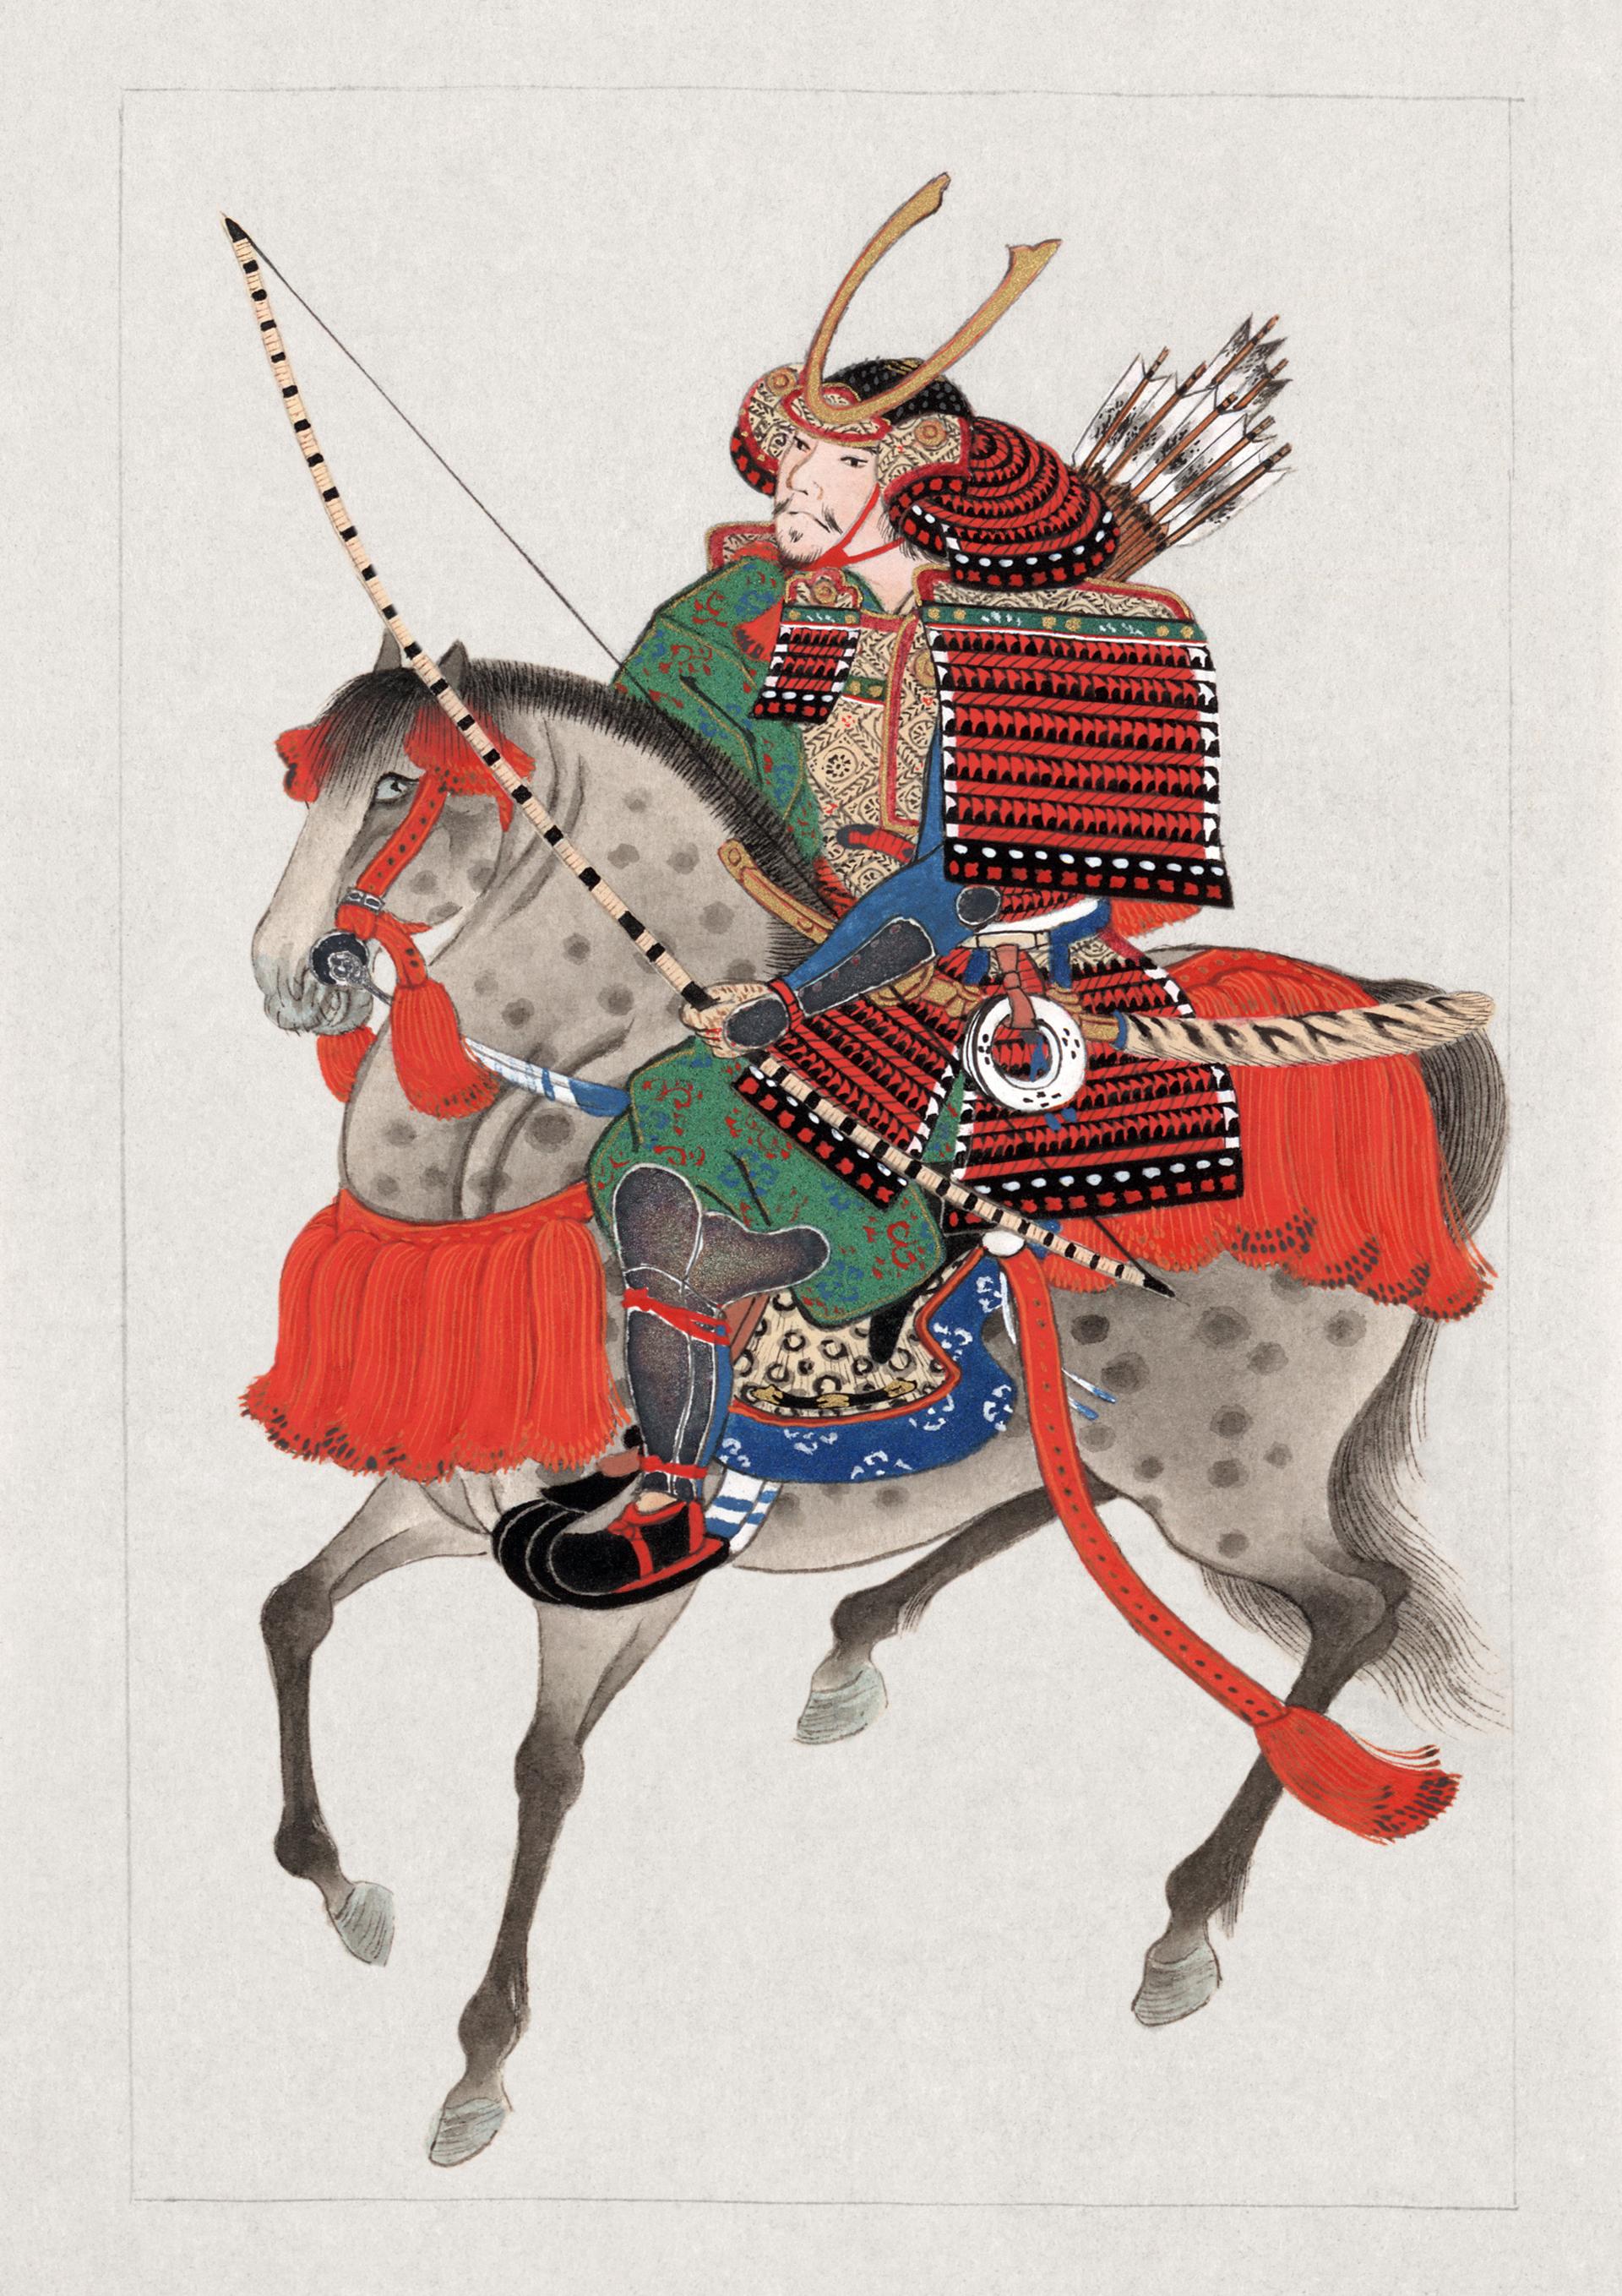 http://upload.wikimedia.org/wikipedia/commons/0/00/Samurai_on_horseback.png